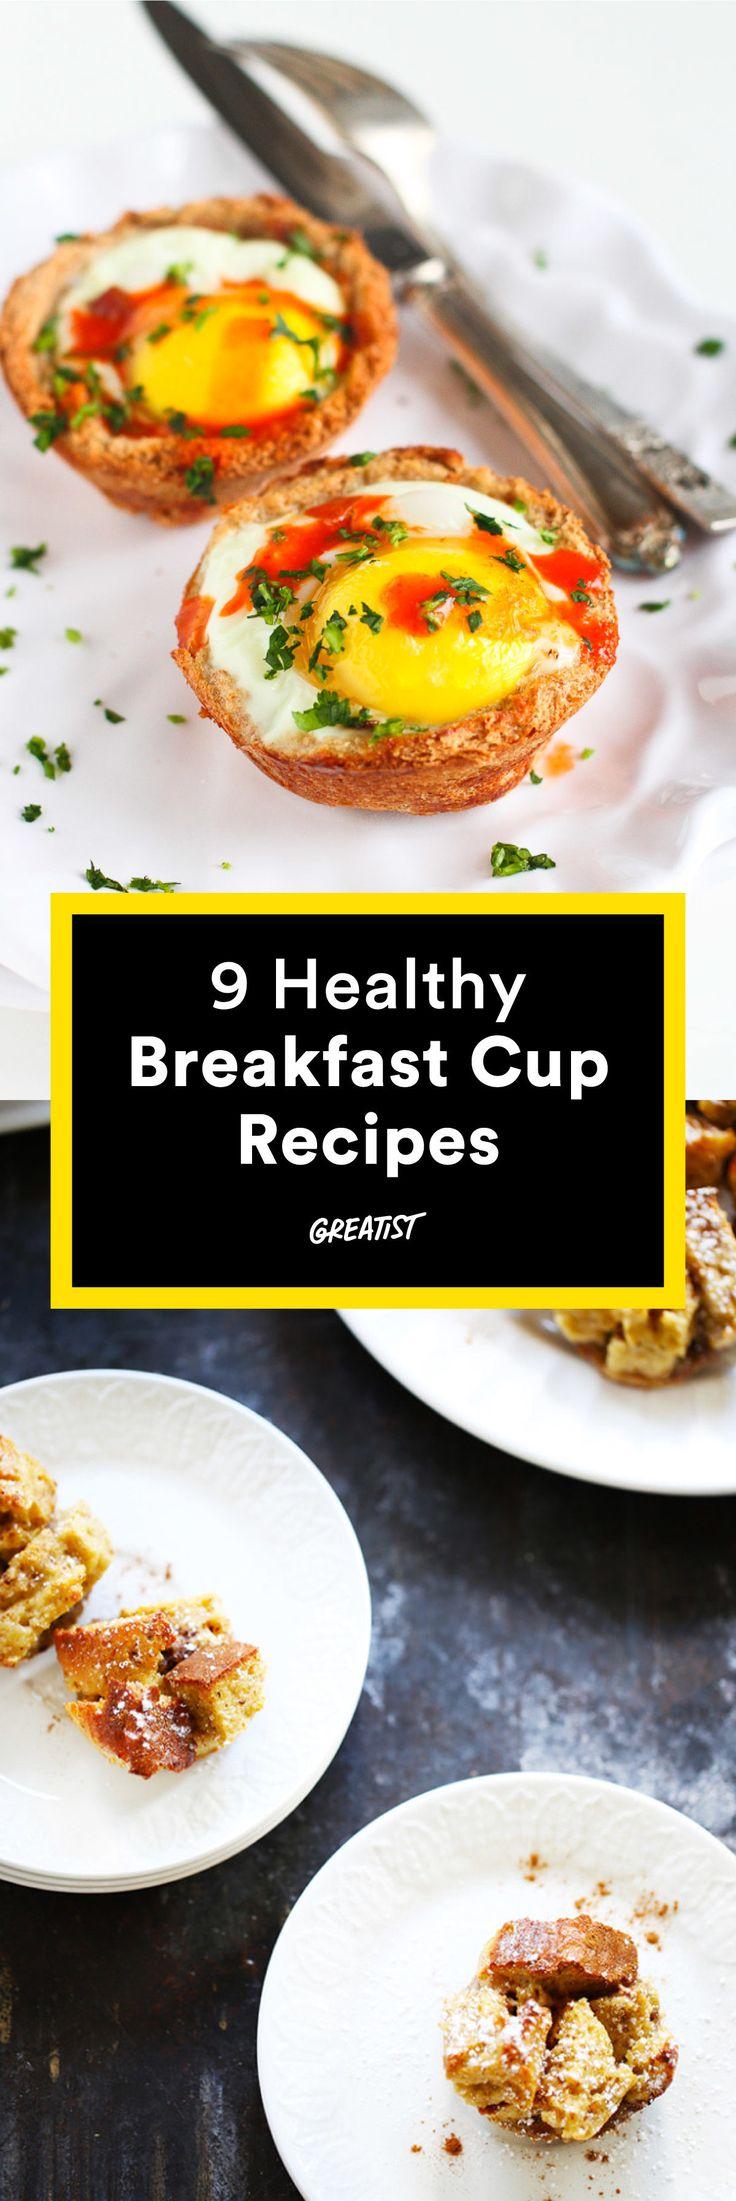 9. Freezer Steel Cut Oats #healthy #breakfast #recipes http://greatist.com/eat/healthy-breakfast-cup-recipes-to-fuel-your-mornings